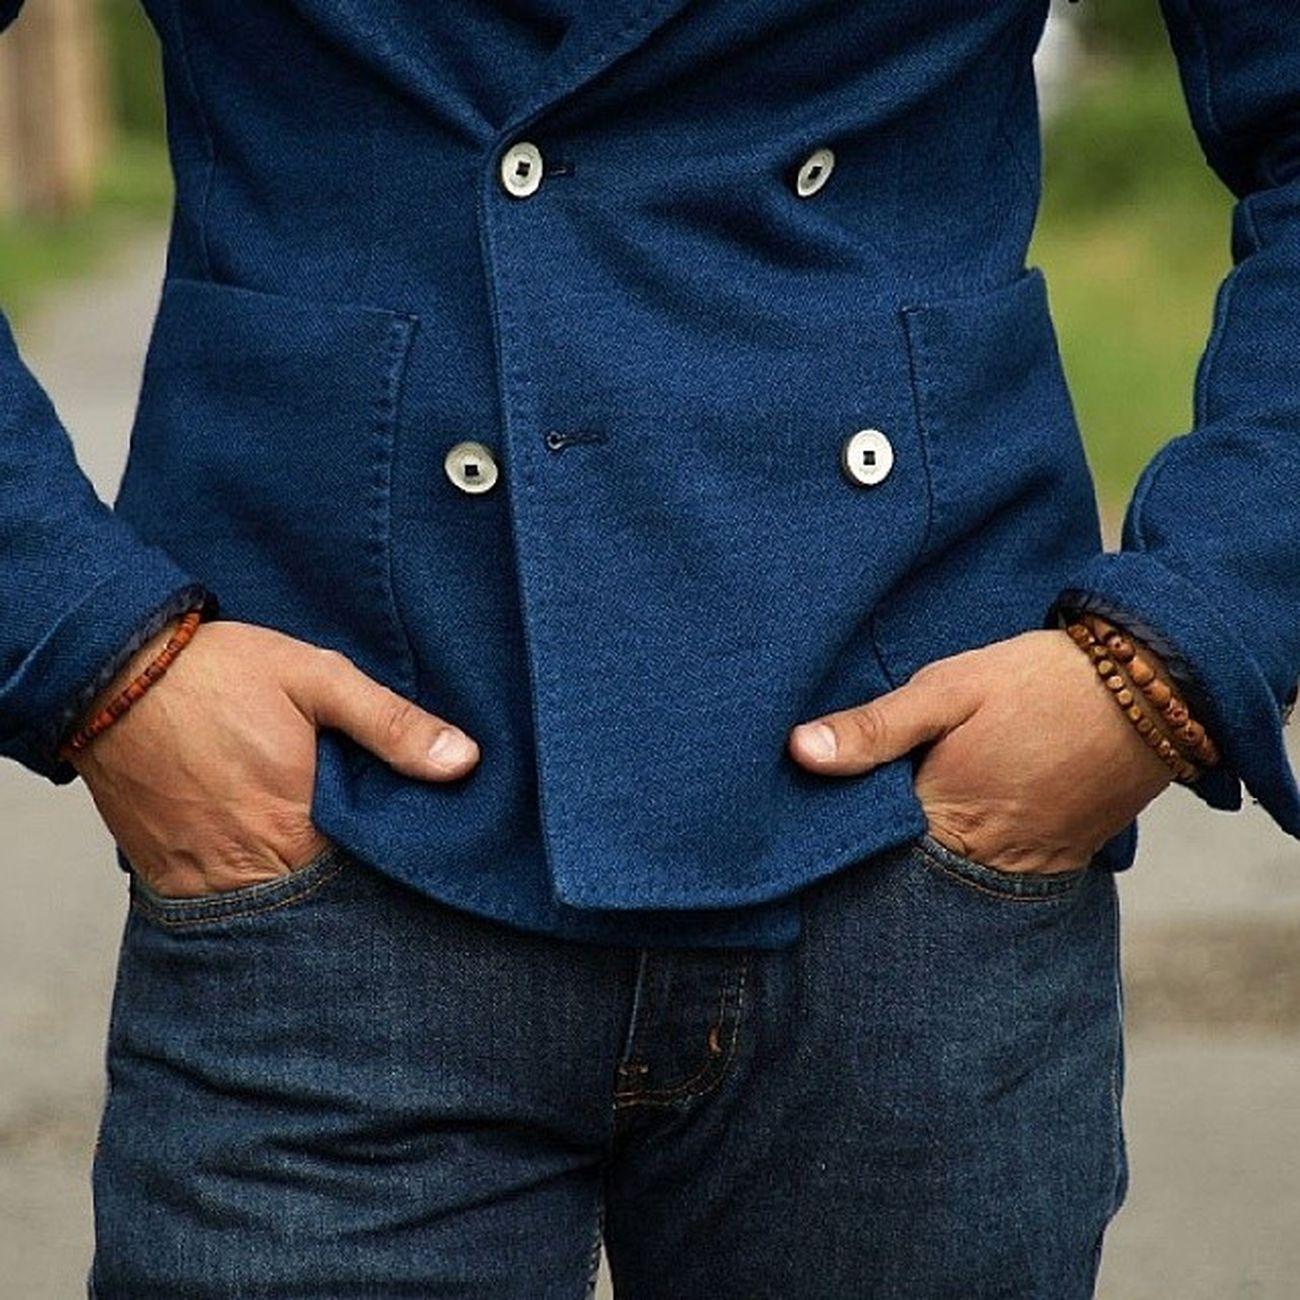 Casual Monday Braceletsformen Staydifferent wrap